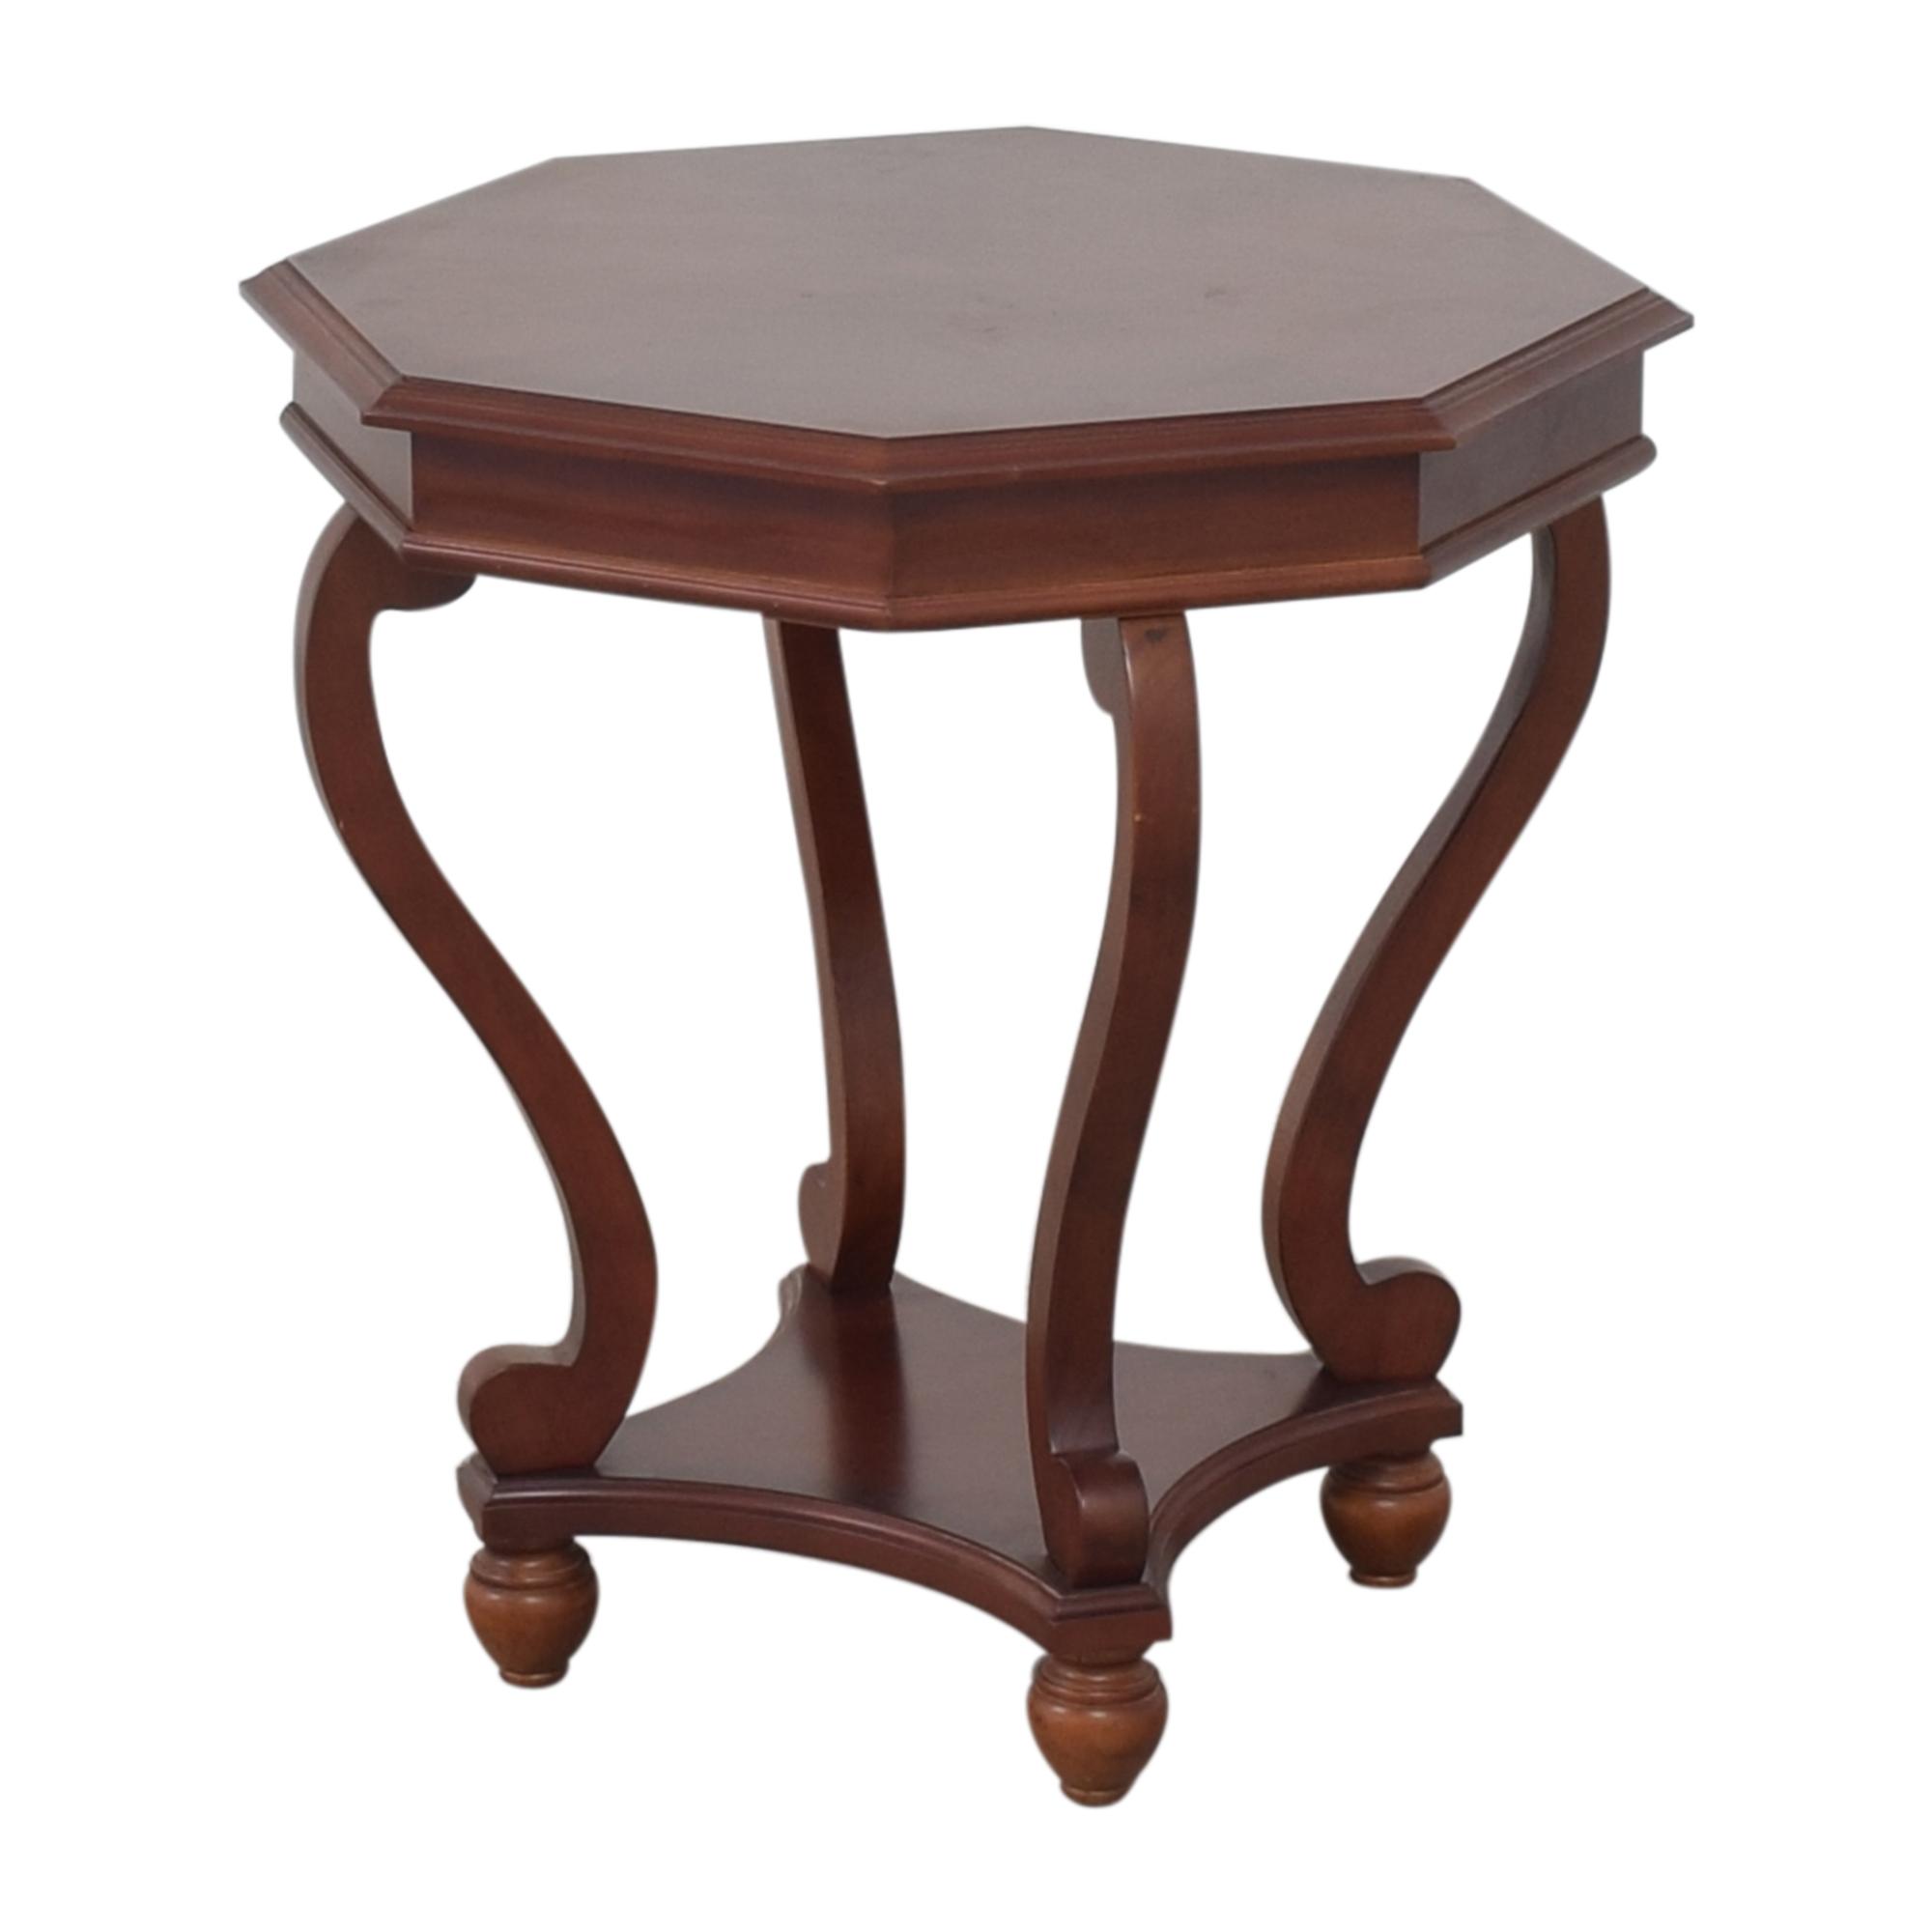 Bombay Company Bombay Company Octagonal Accent Table brown